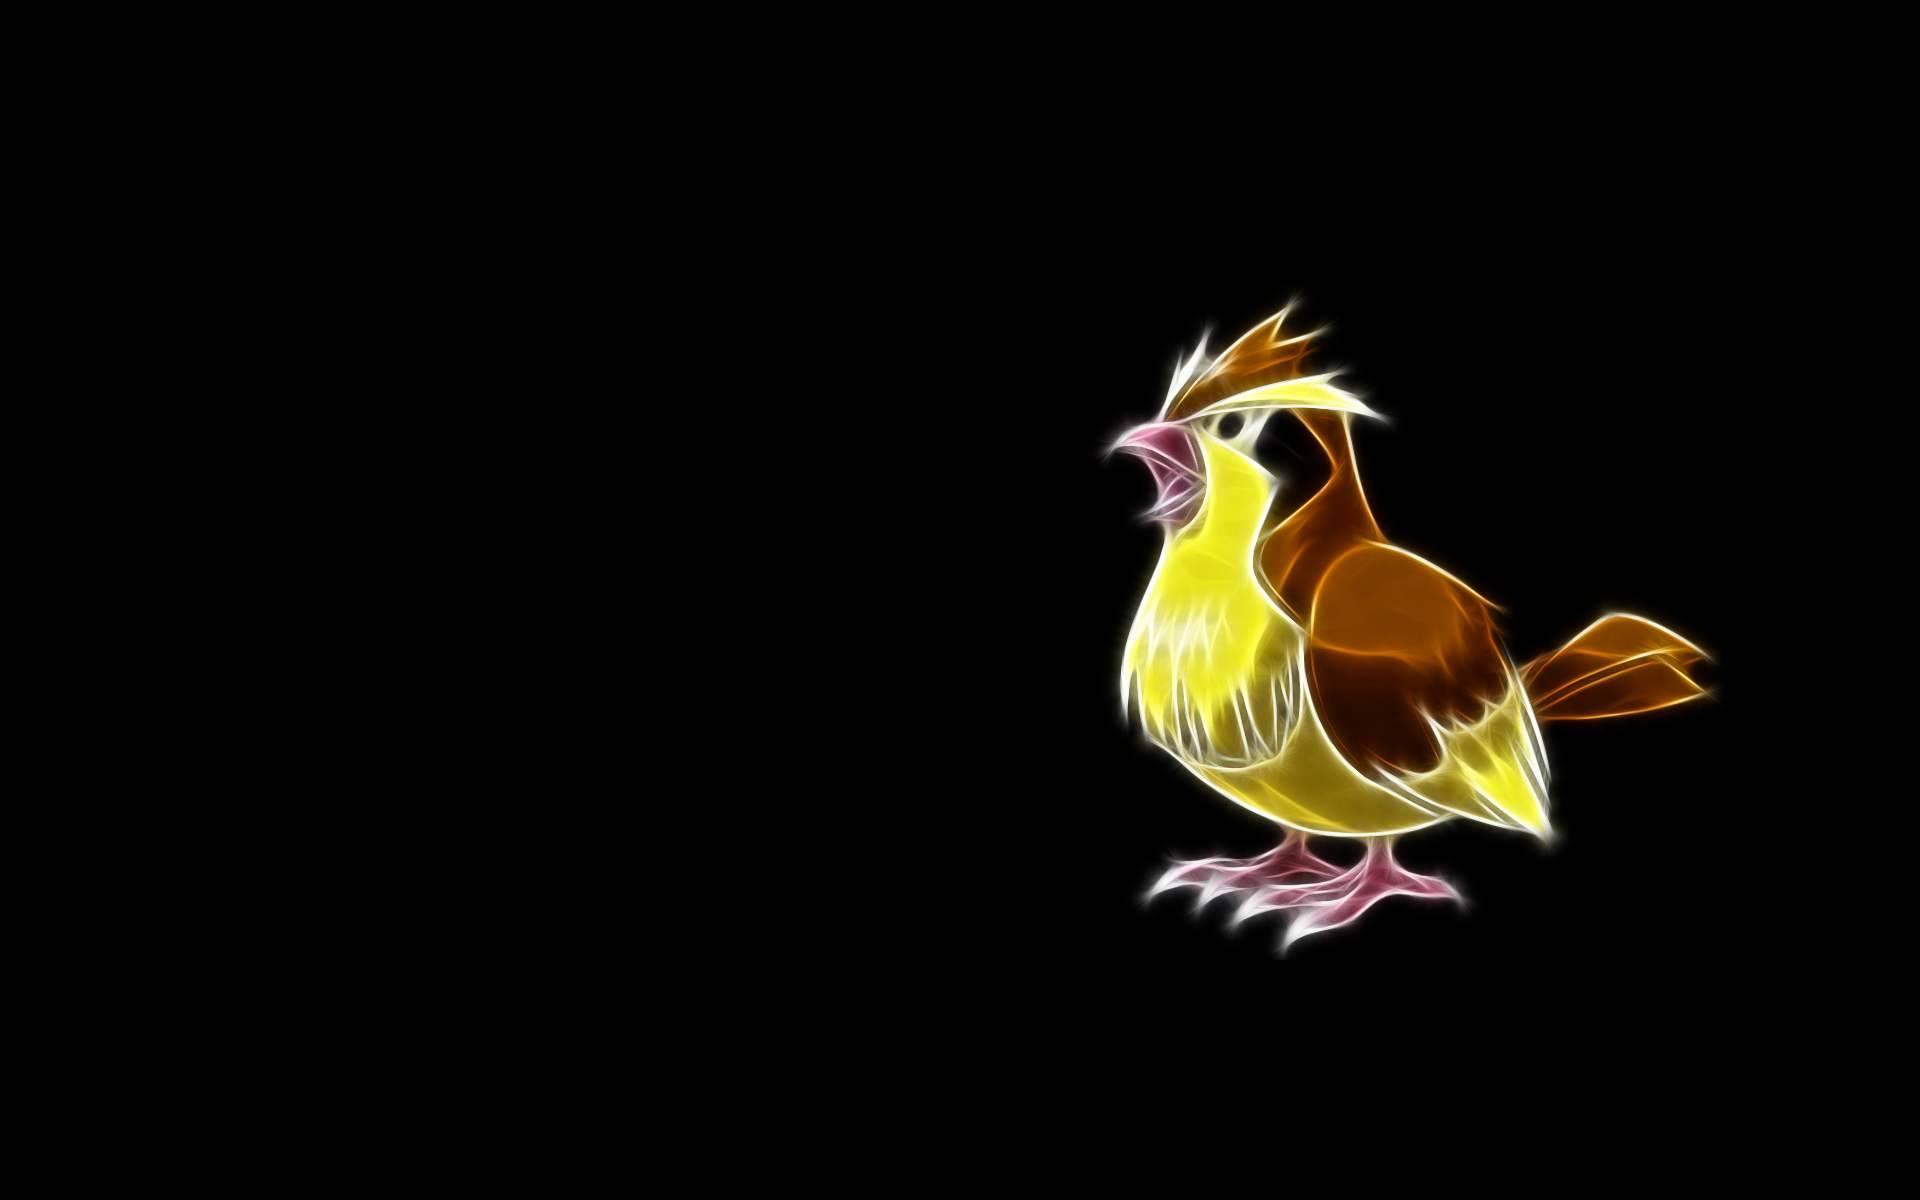 Pokemon Pidgey Images Pokemon Images 1920x1200